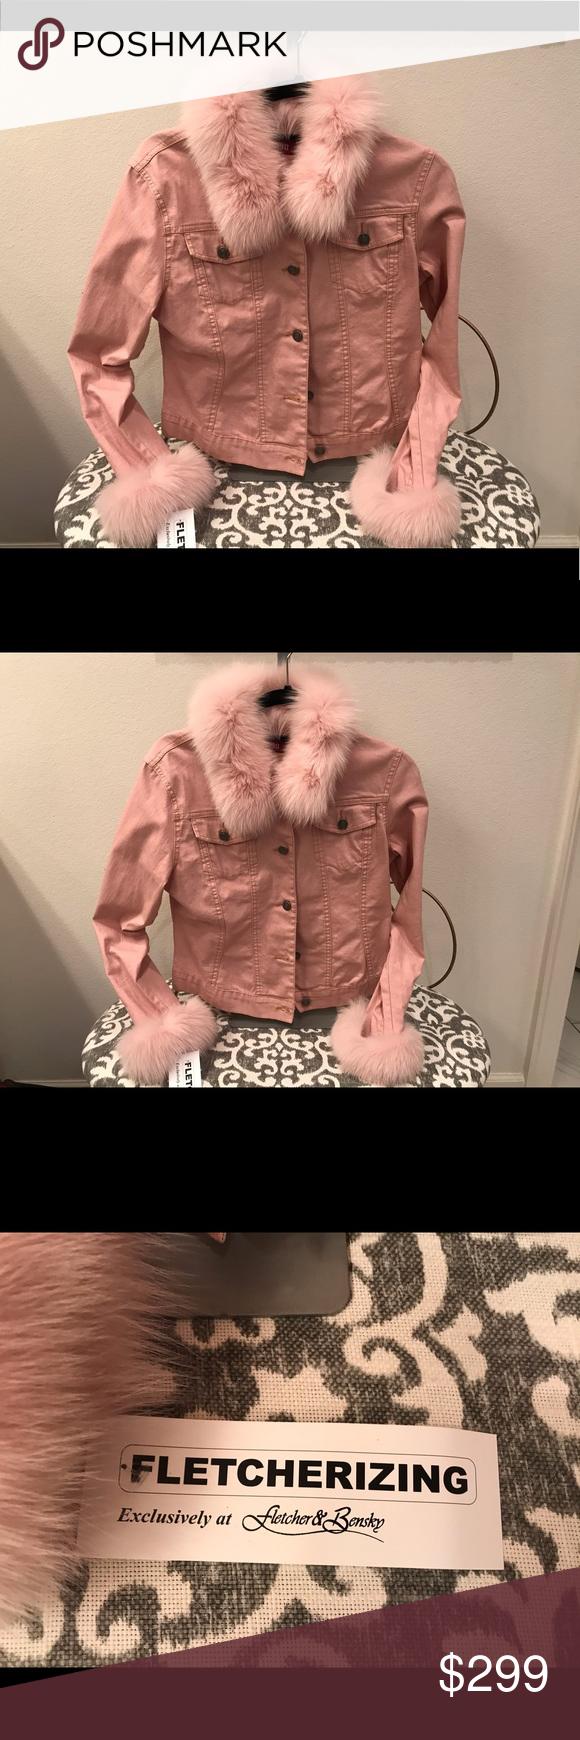 For Trade Only Don T Buy Pink Denim Jacket Pink Fur Clothes Design [ 1740 x 580 Pixel ]